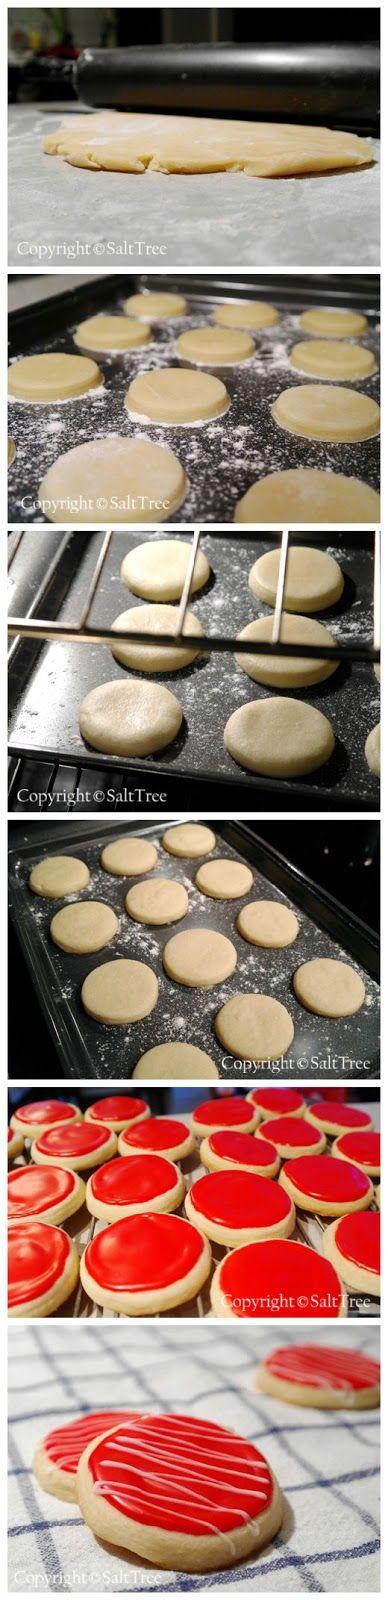 Soft Sugar Cookies 3 cups all-purpose flour 1 teaspoon baking powder 1/2 teaspoon salt 1 cup butter, softened 1 1/2 cups white sugar 2 eggs 2 teaspoons vanilla extract